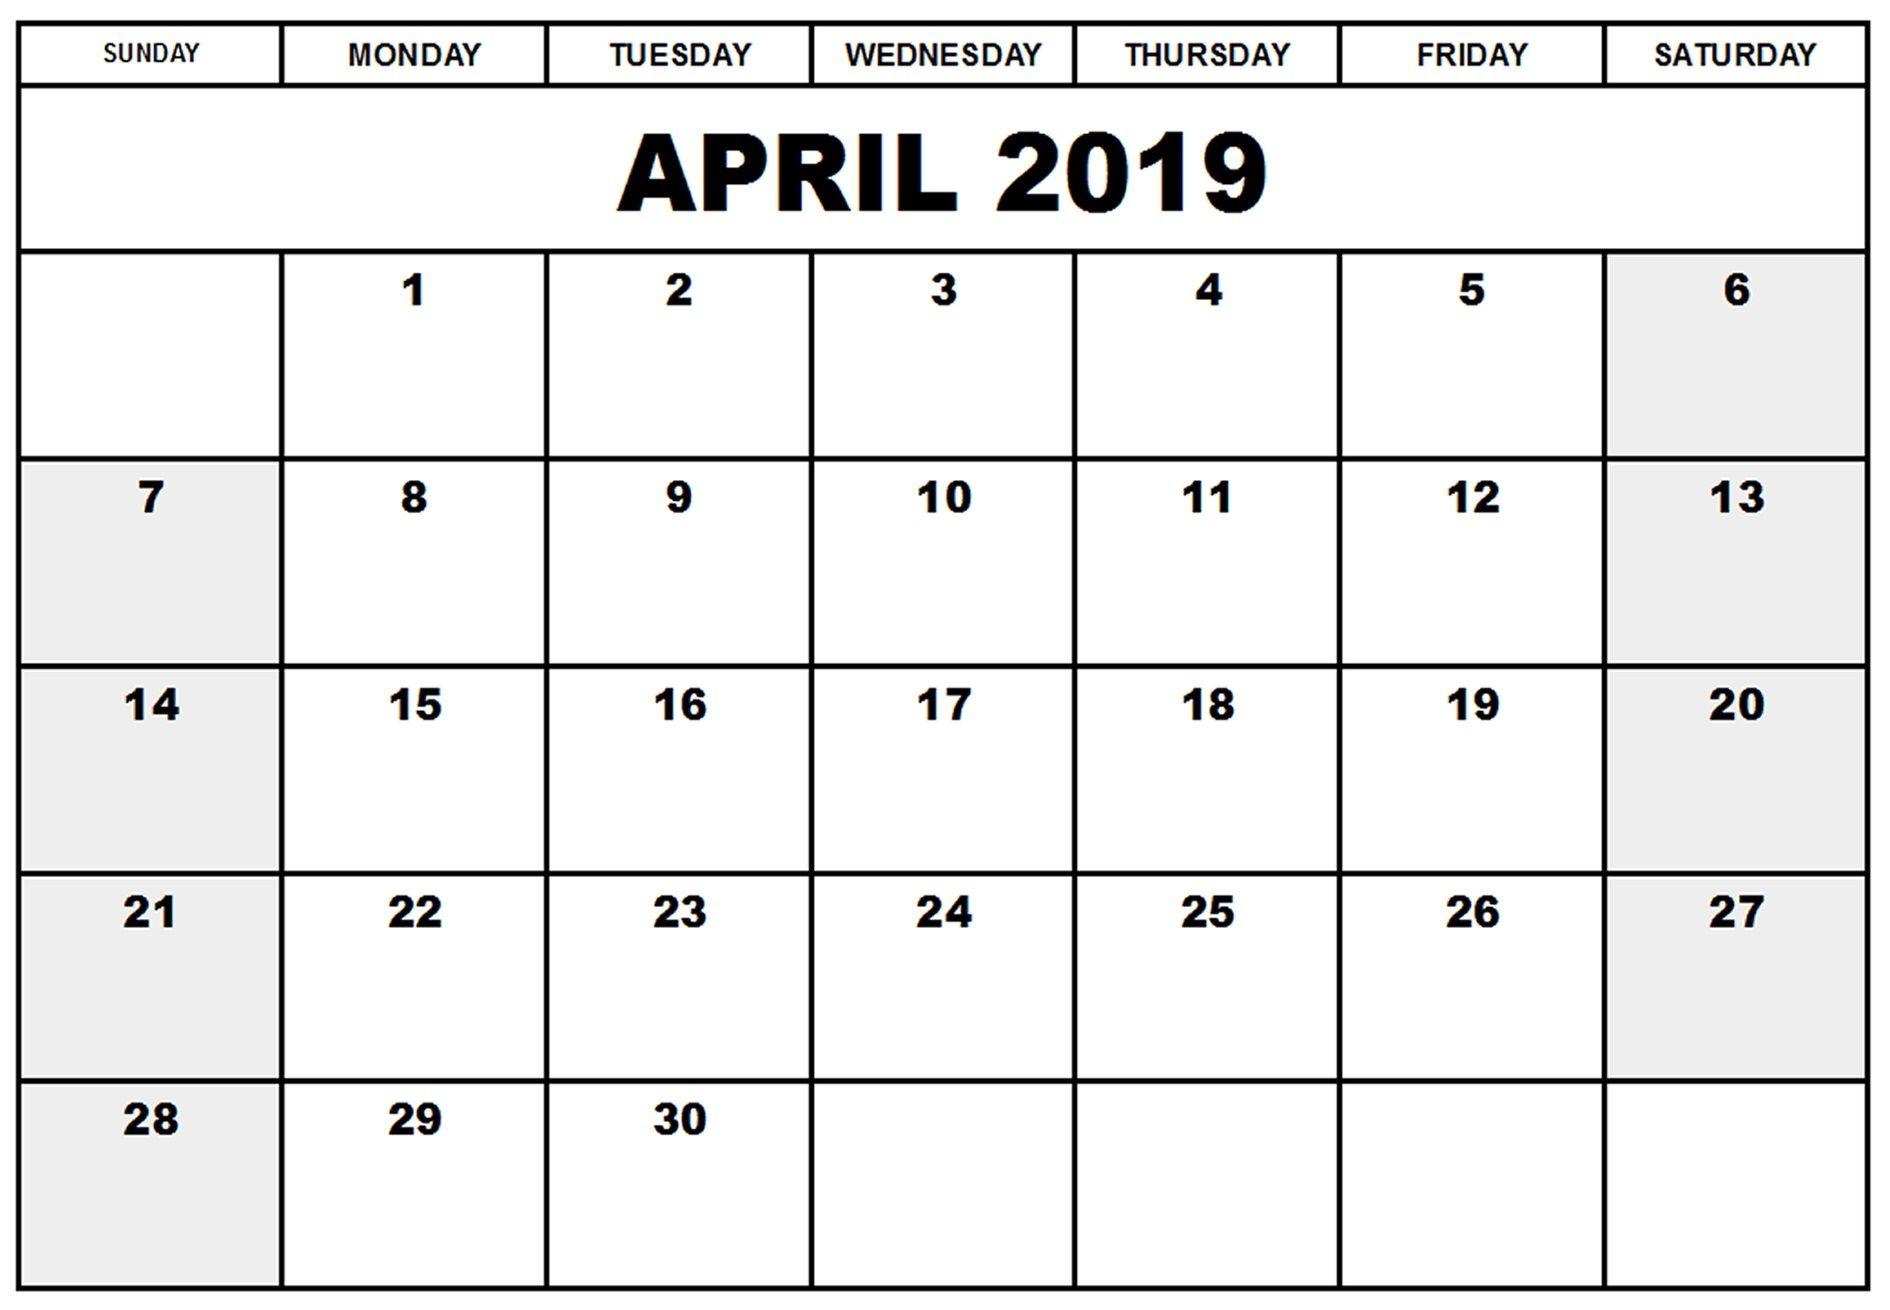 April 2019 Printable Calendar Excel | April 2019 Printable